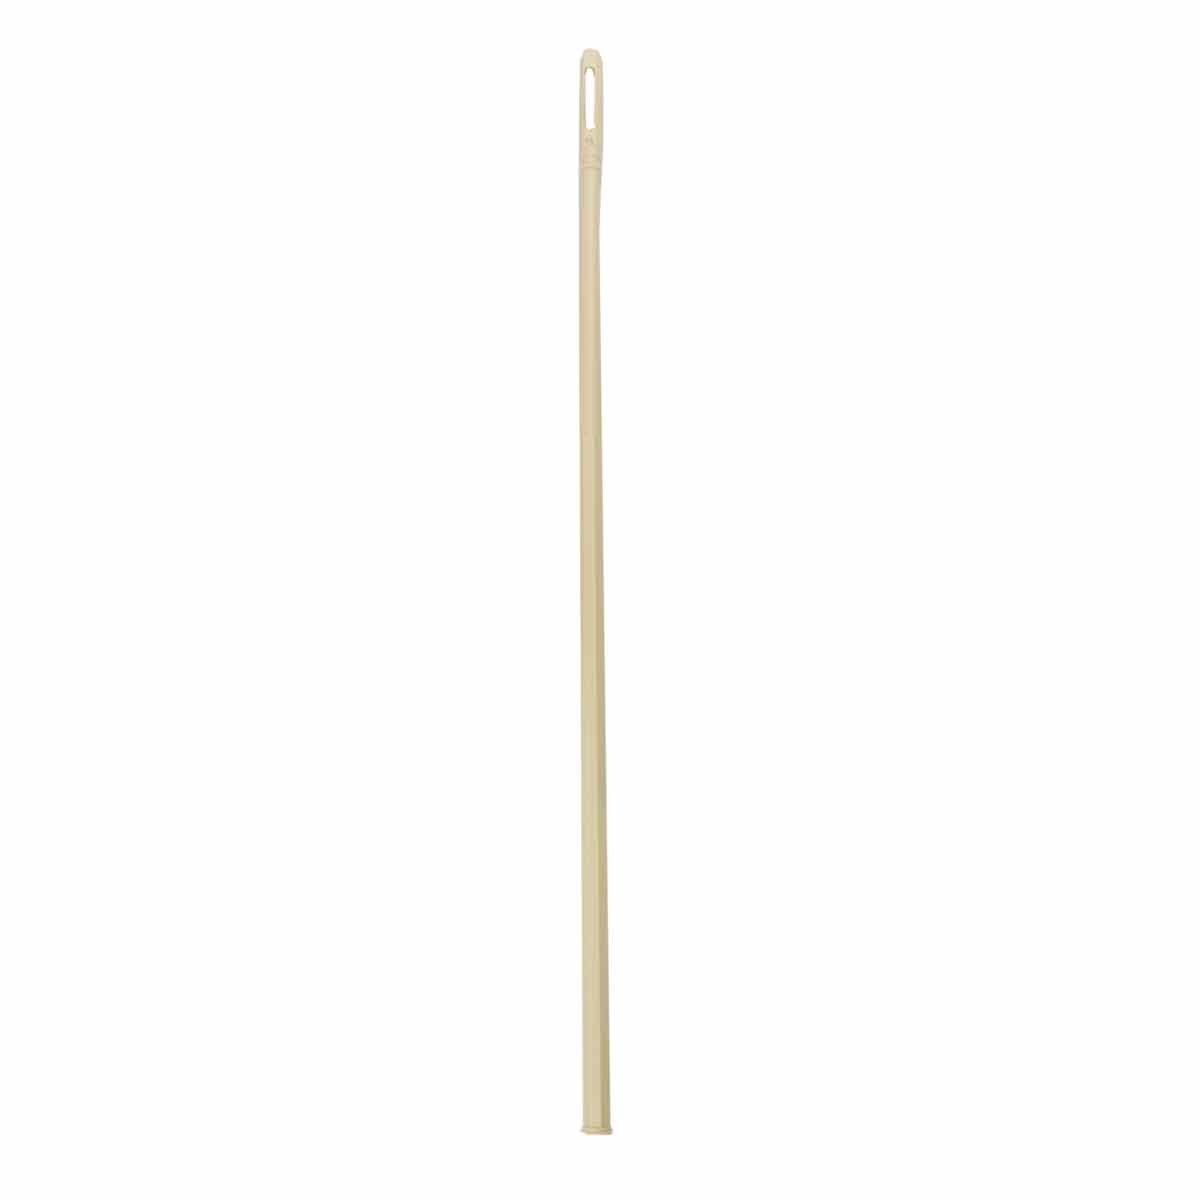 Flauta Doce Germânica - SH 1503 Victory